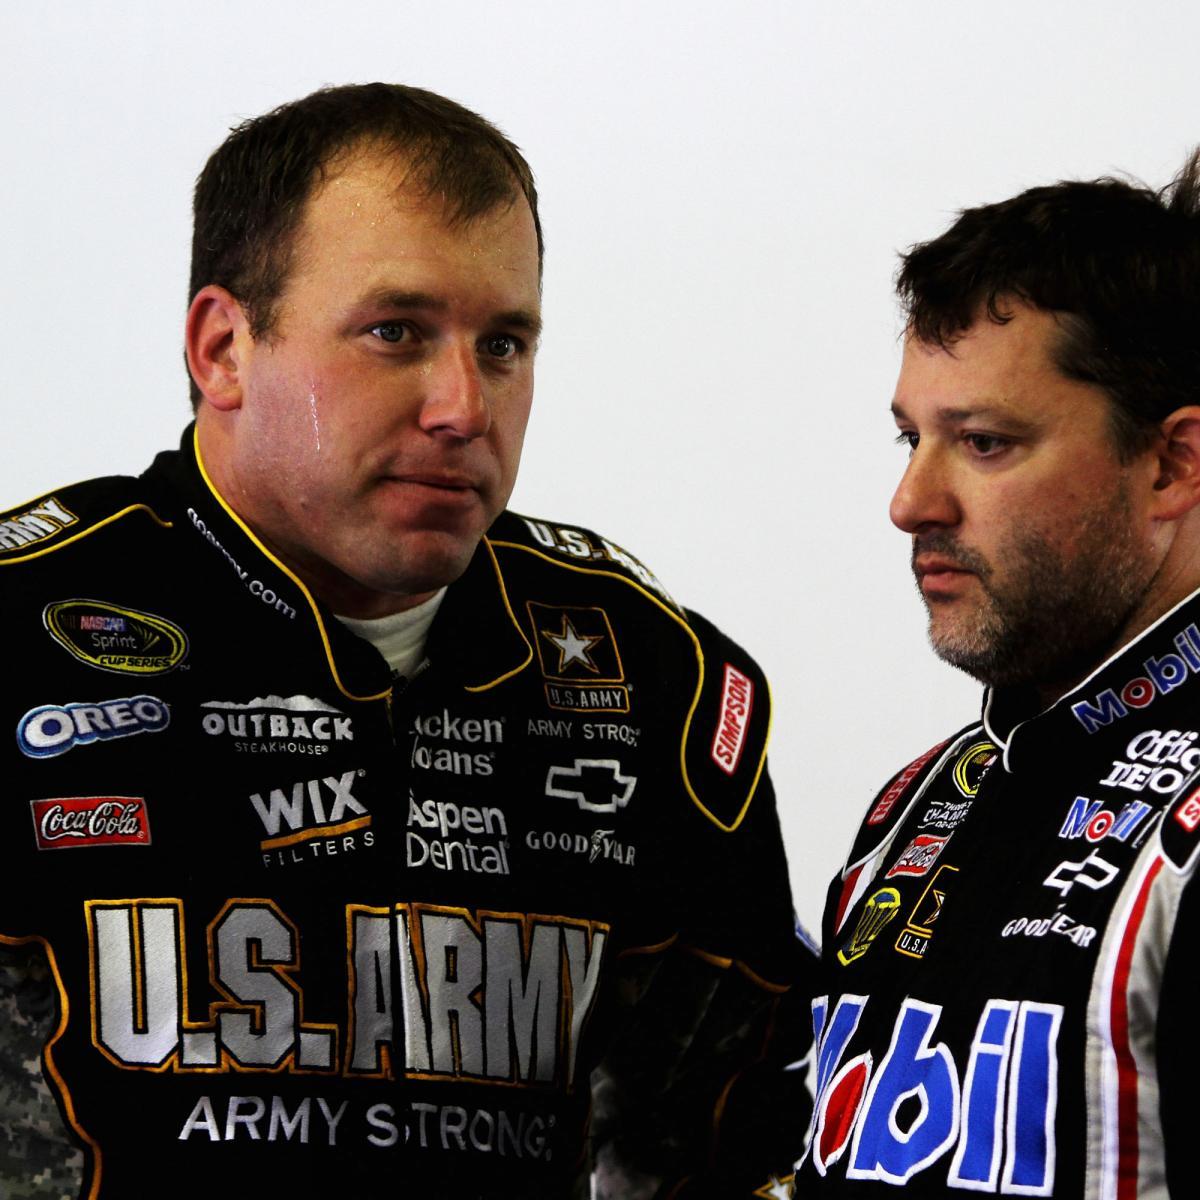 NASCAR: Ryan Newman's One Year Deal With Stewart-Haas